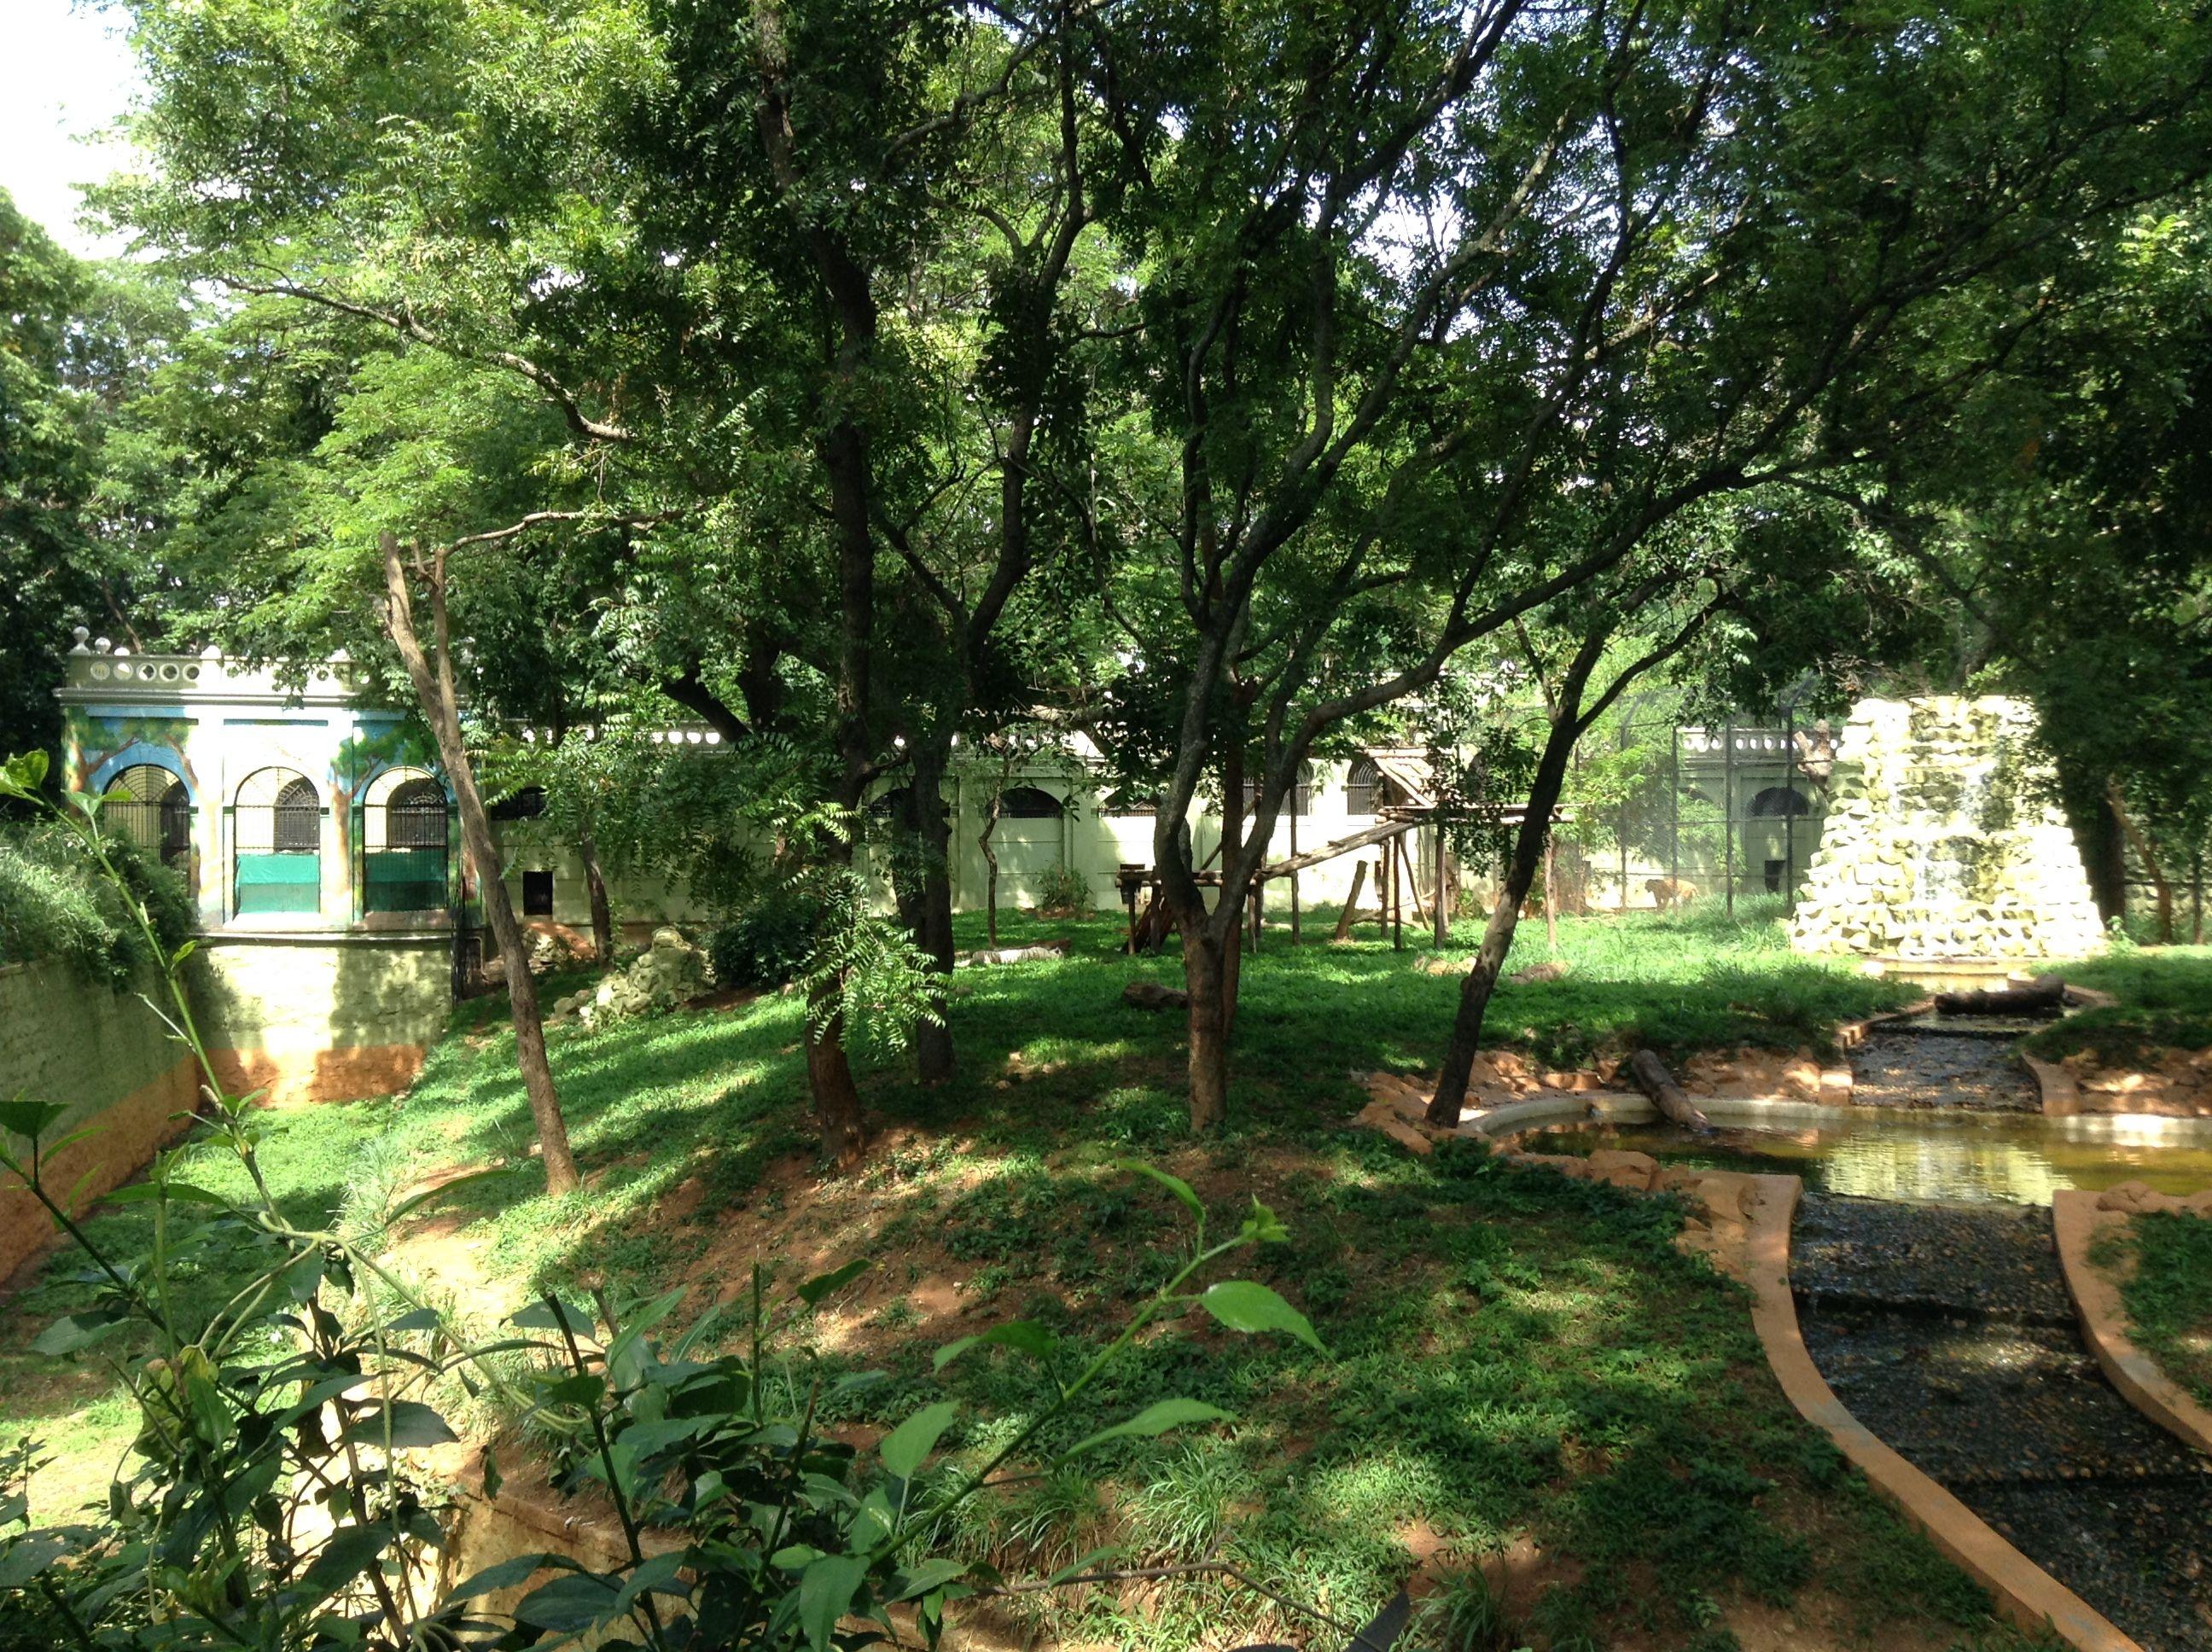 f2bdd3c4c96fea21a472455010491d2d - Mysore Zoo Sri Chamarajendra Zoological Gardens